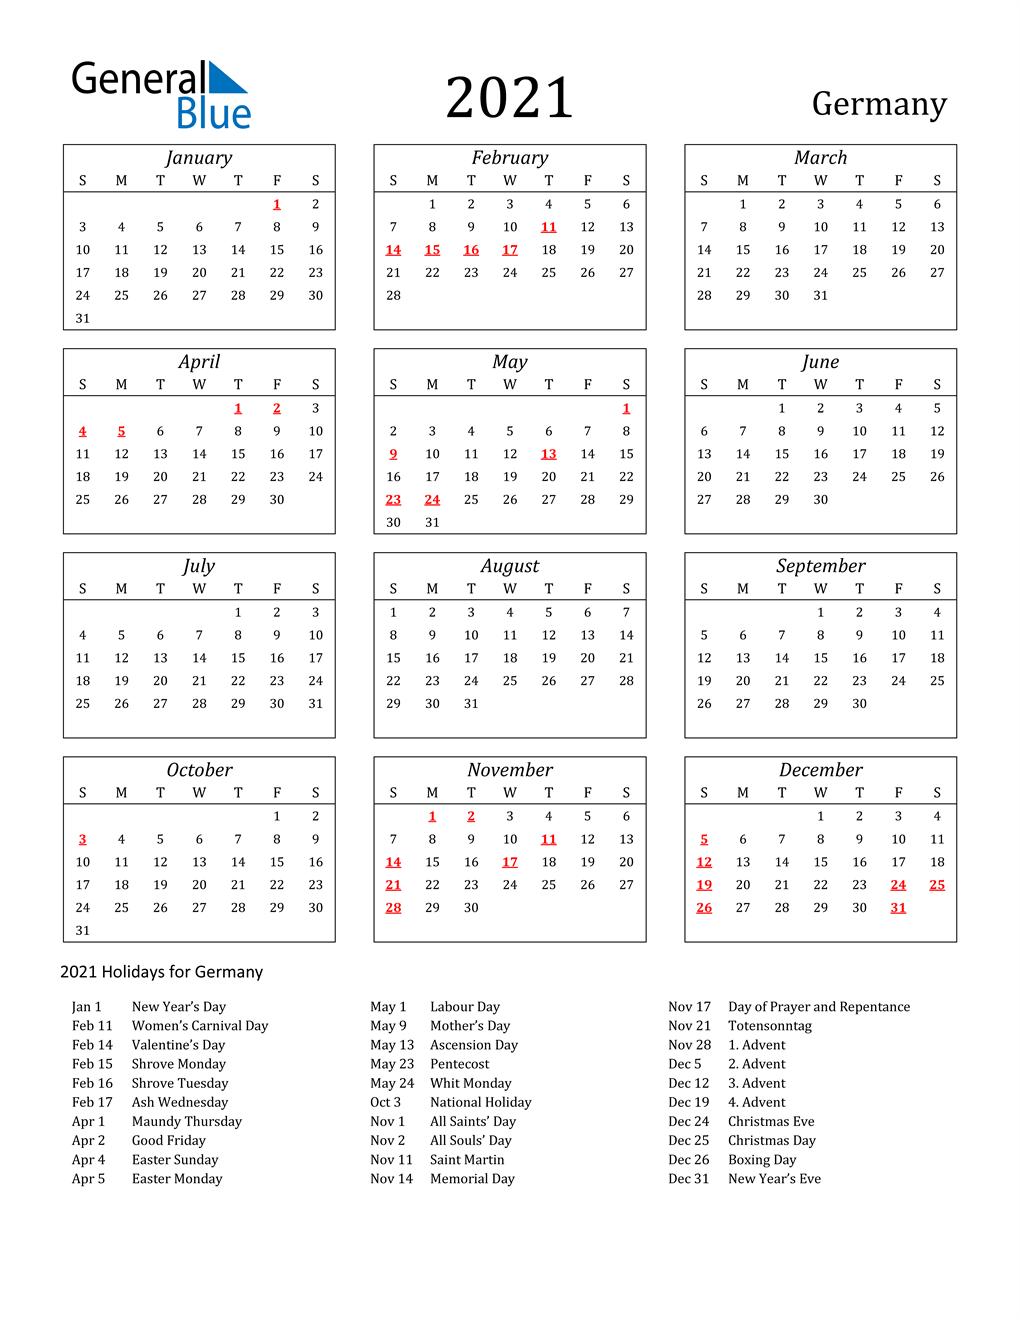 20 Germany Calendar with Holidays